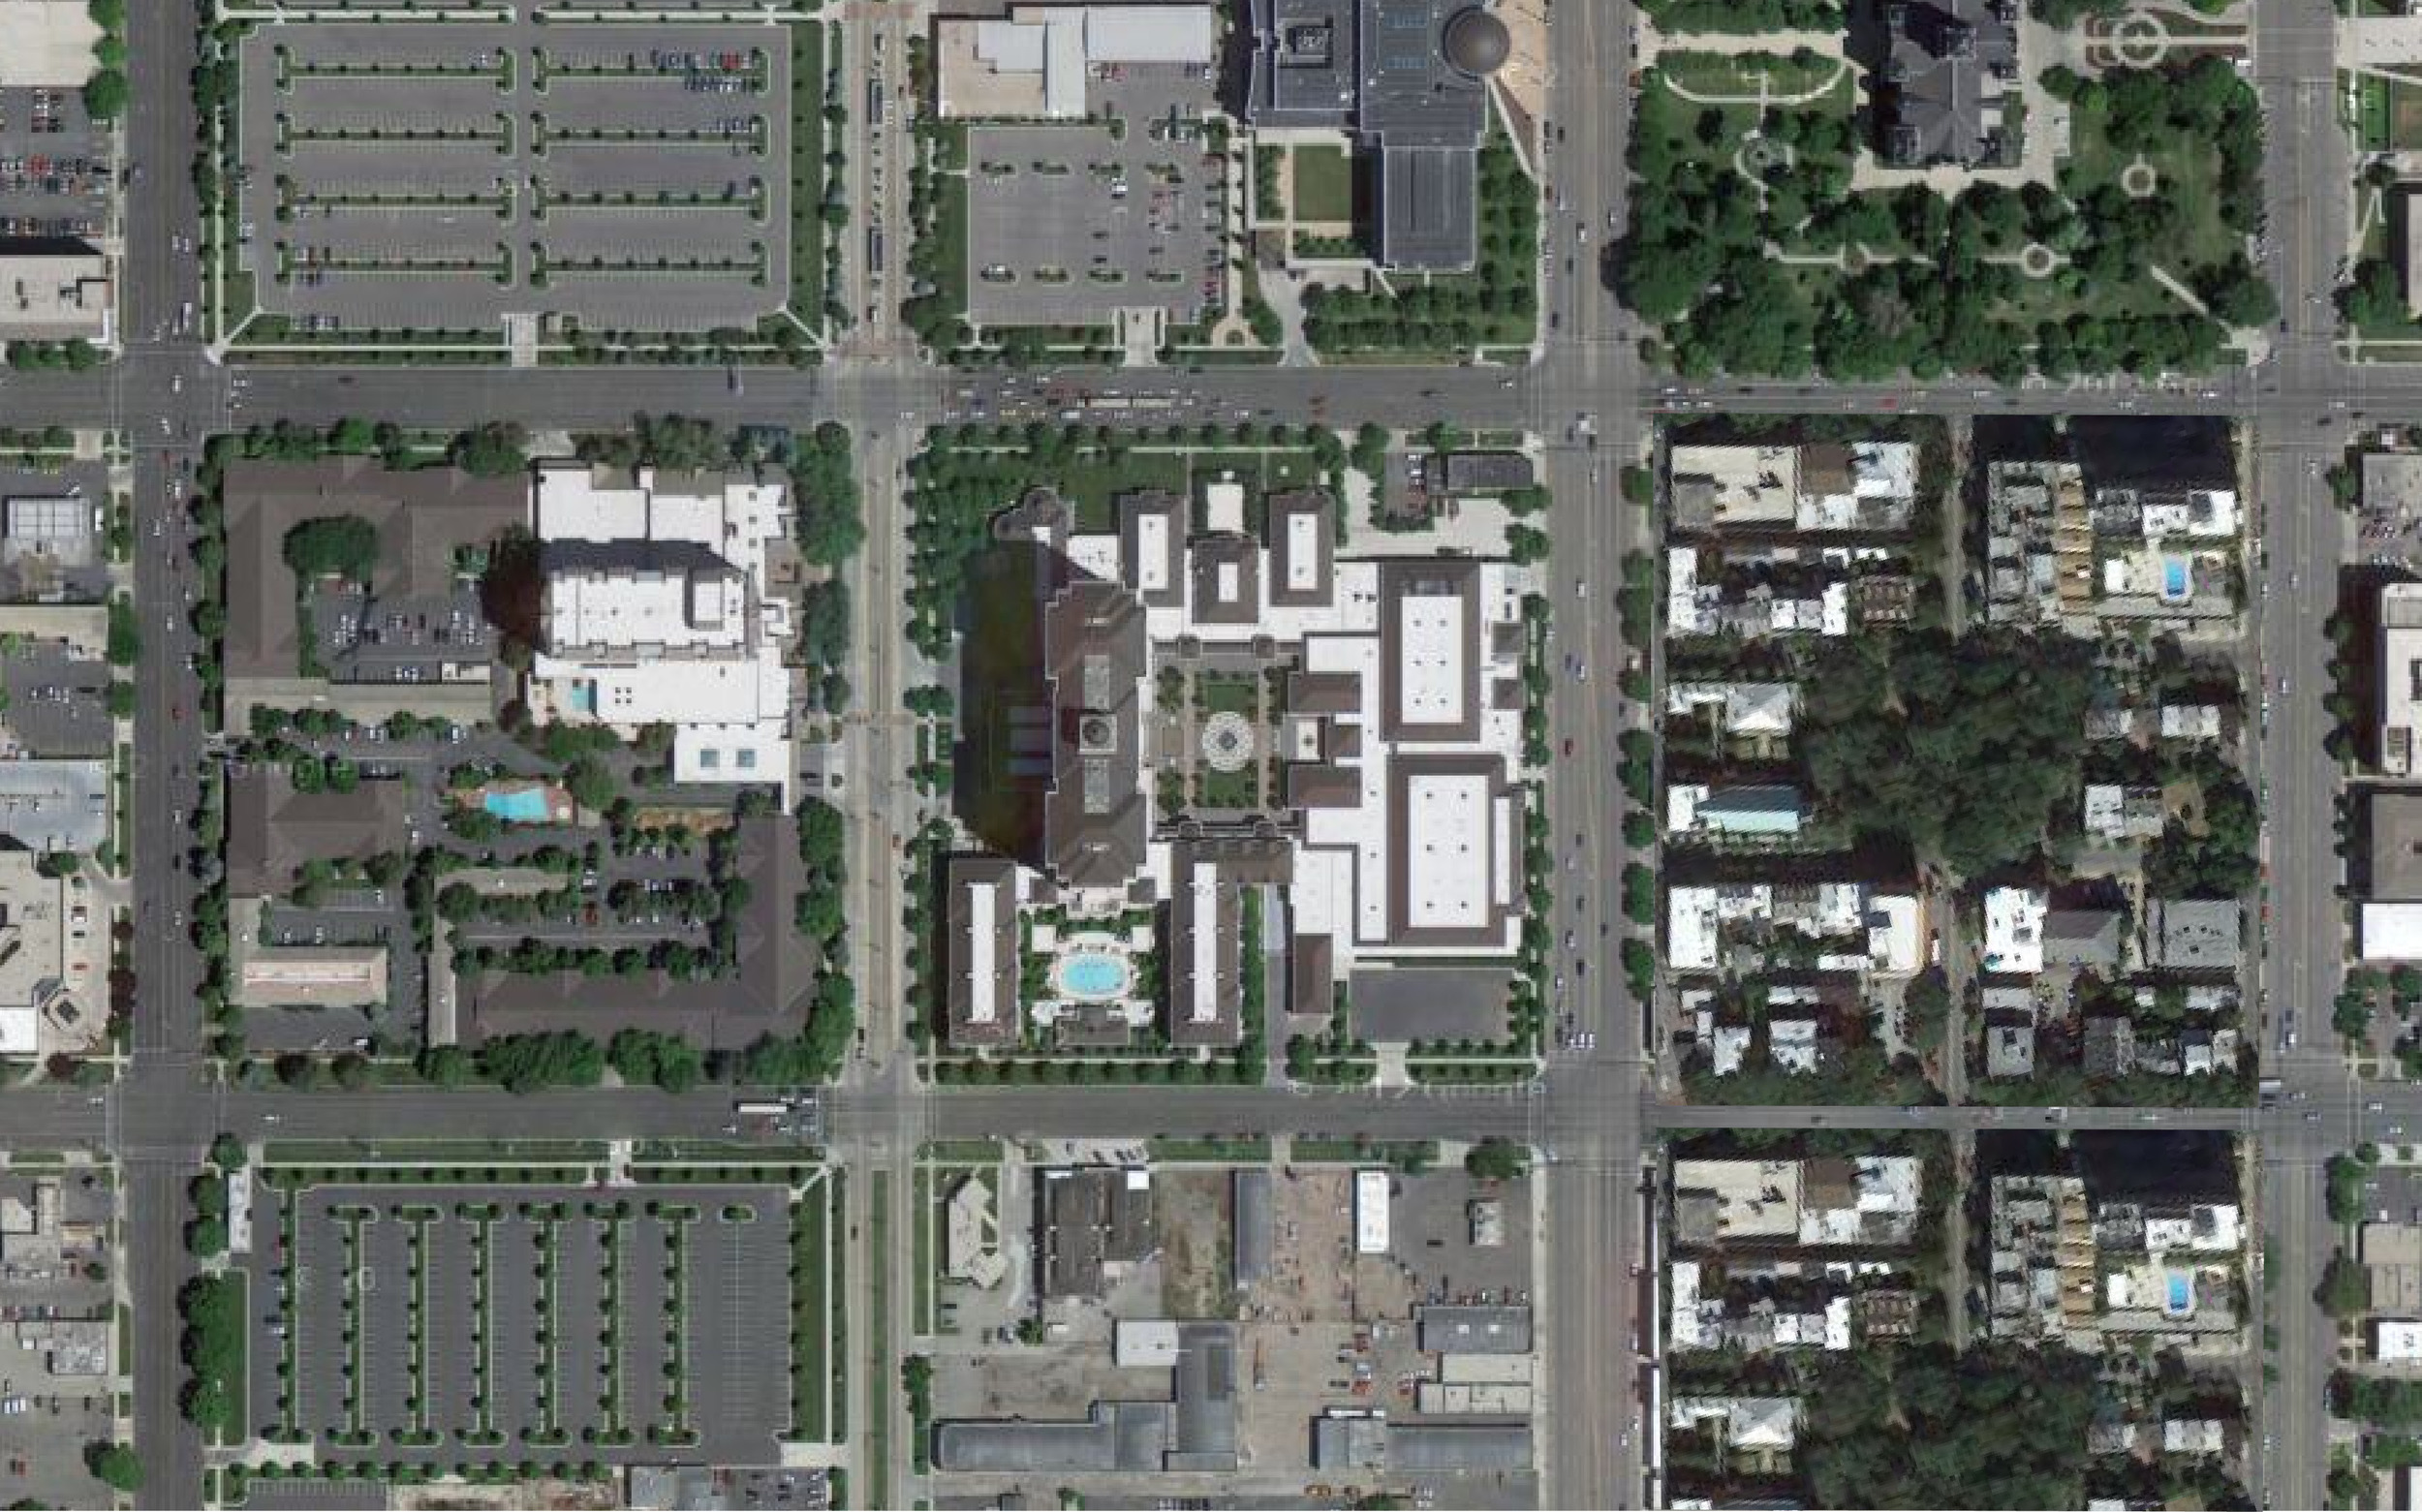 mormon block with savannah ward